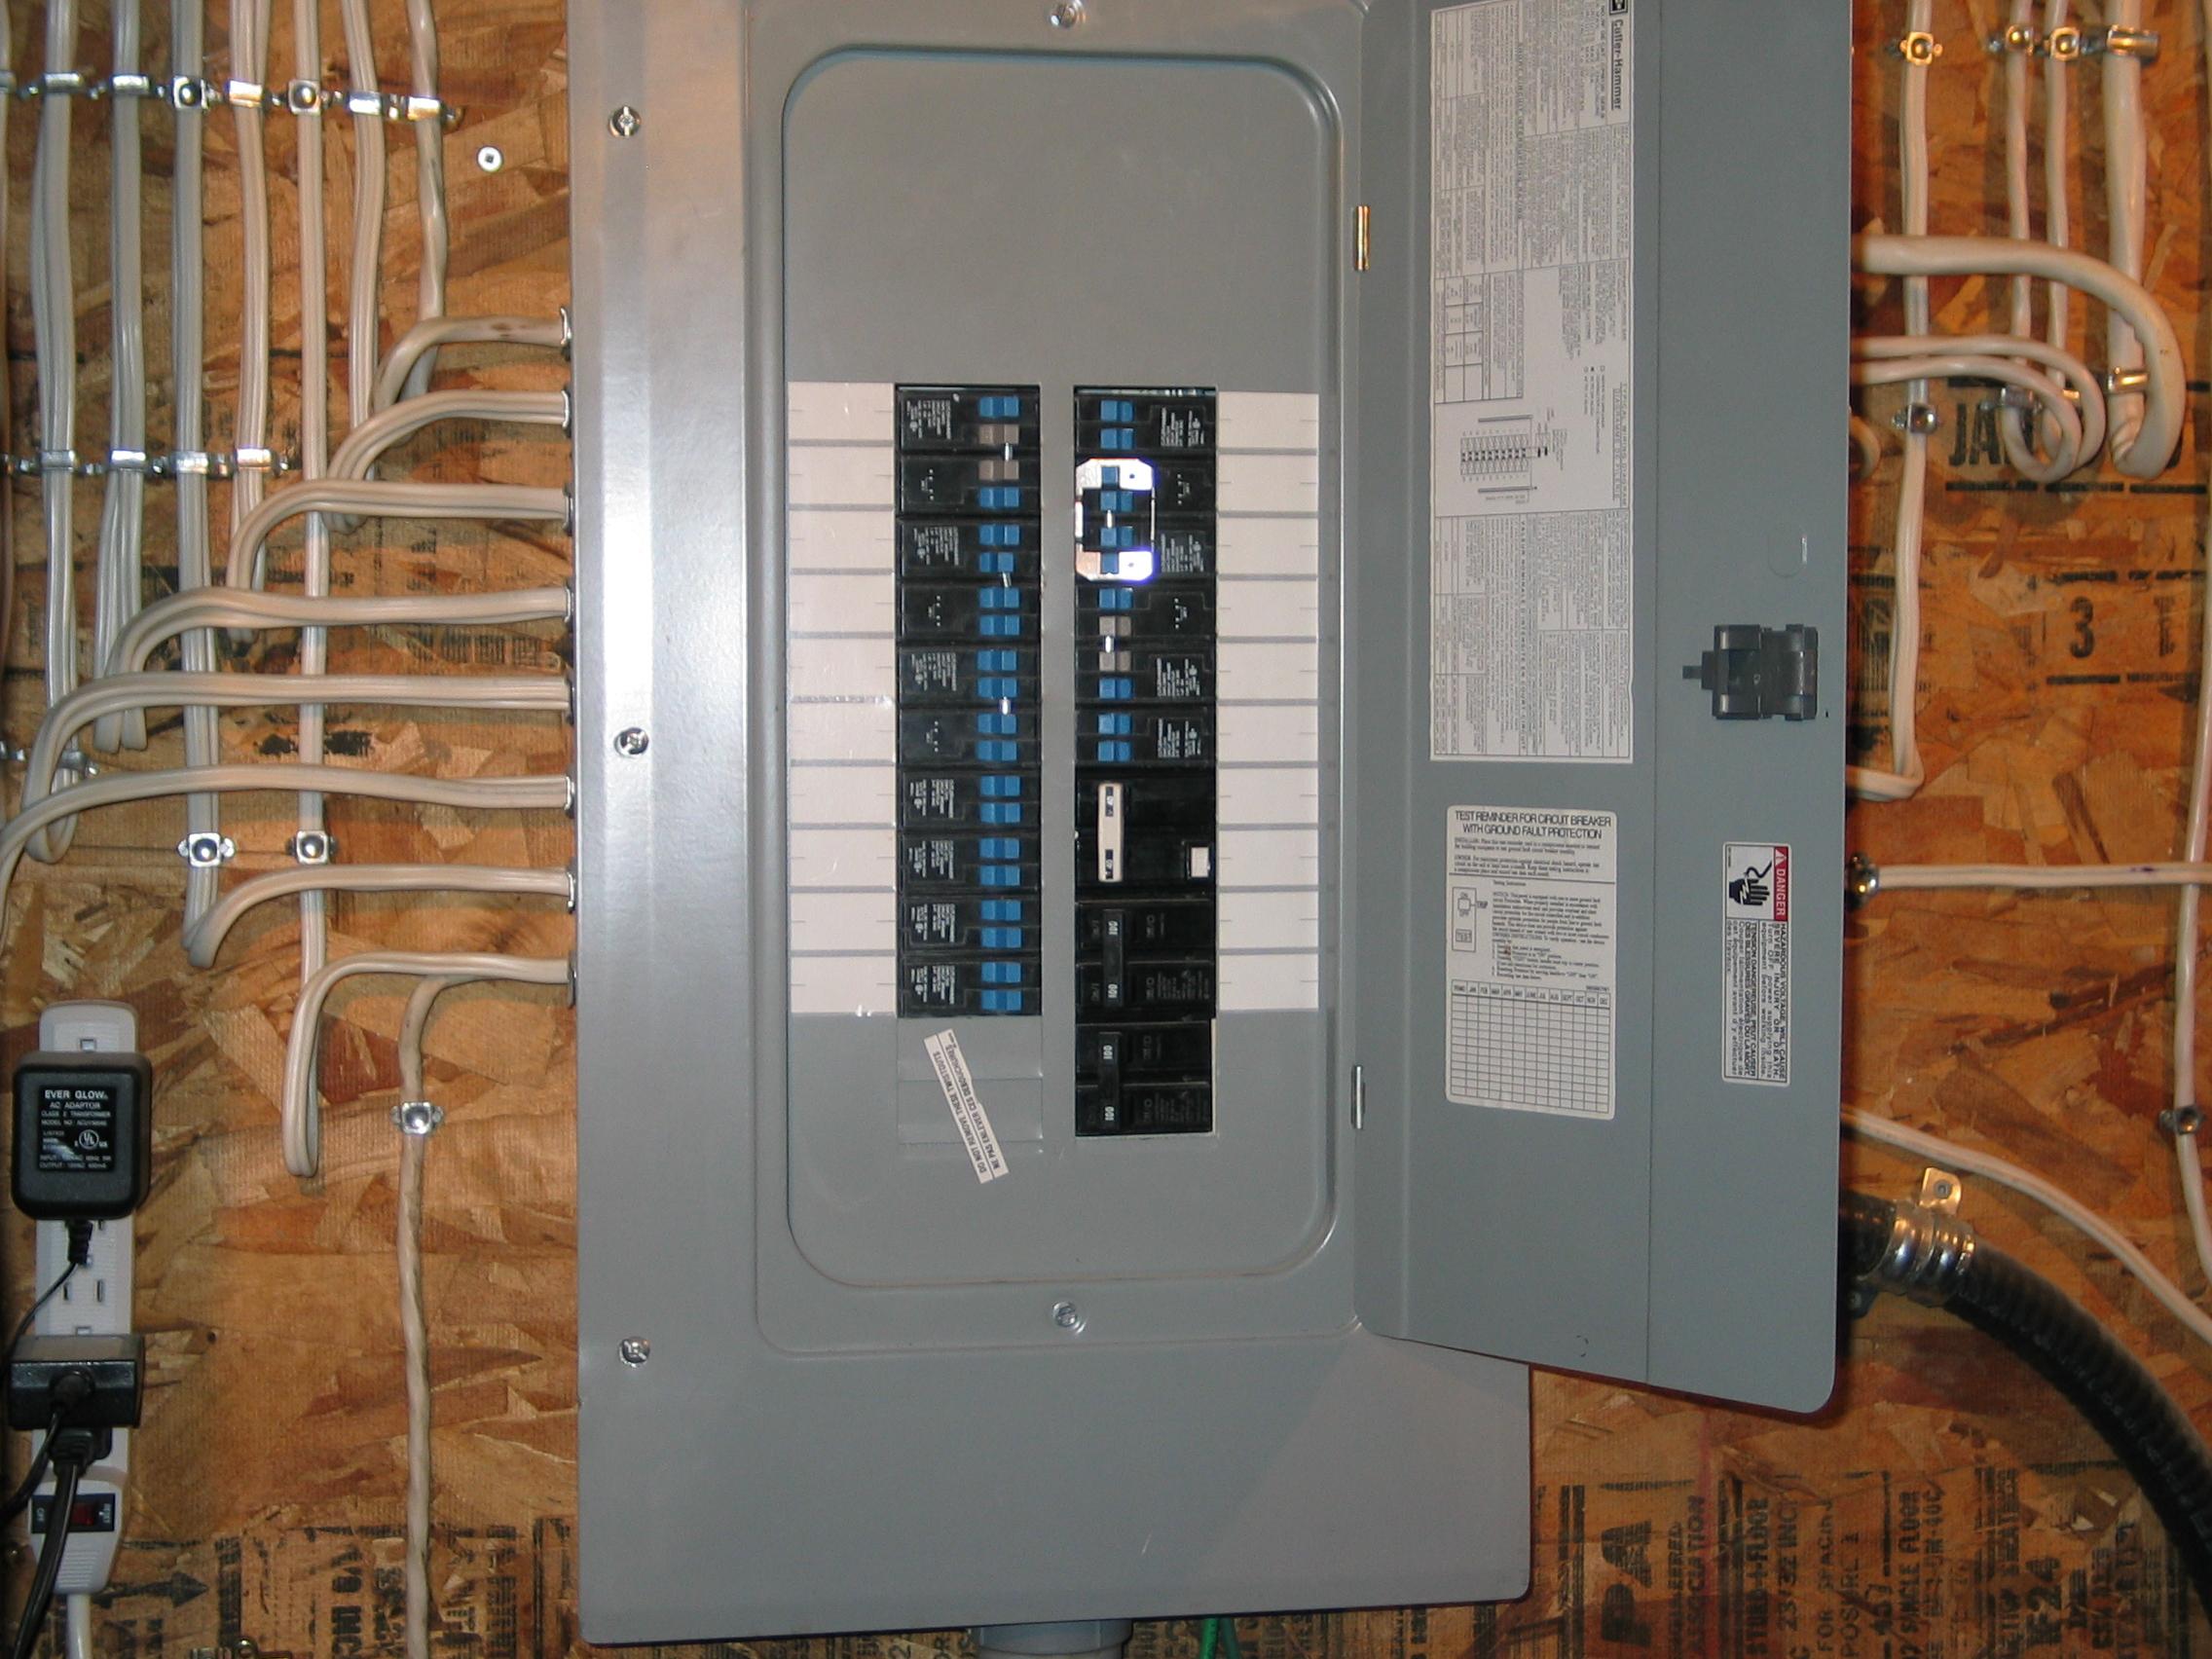 220-240 Wiring Diagram Instructions - Dannychesnut - Sub Panel Wiring Diagram